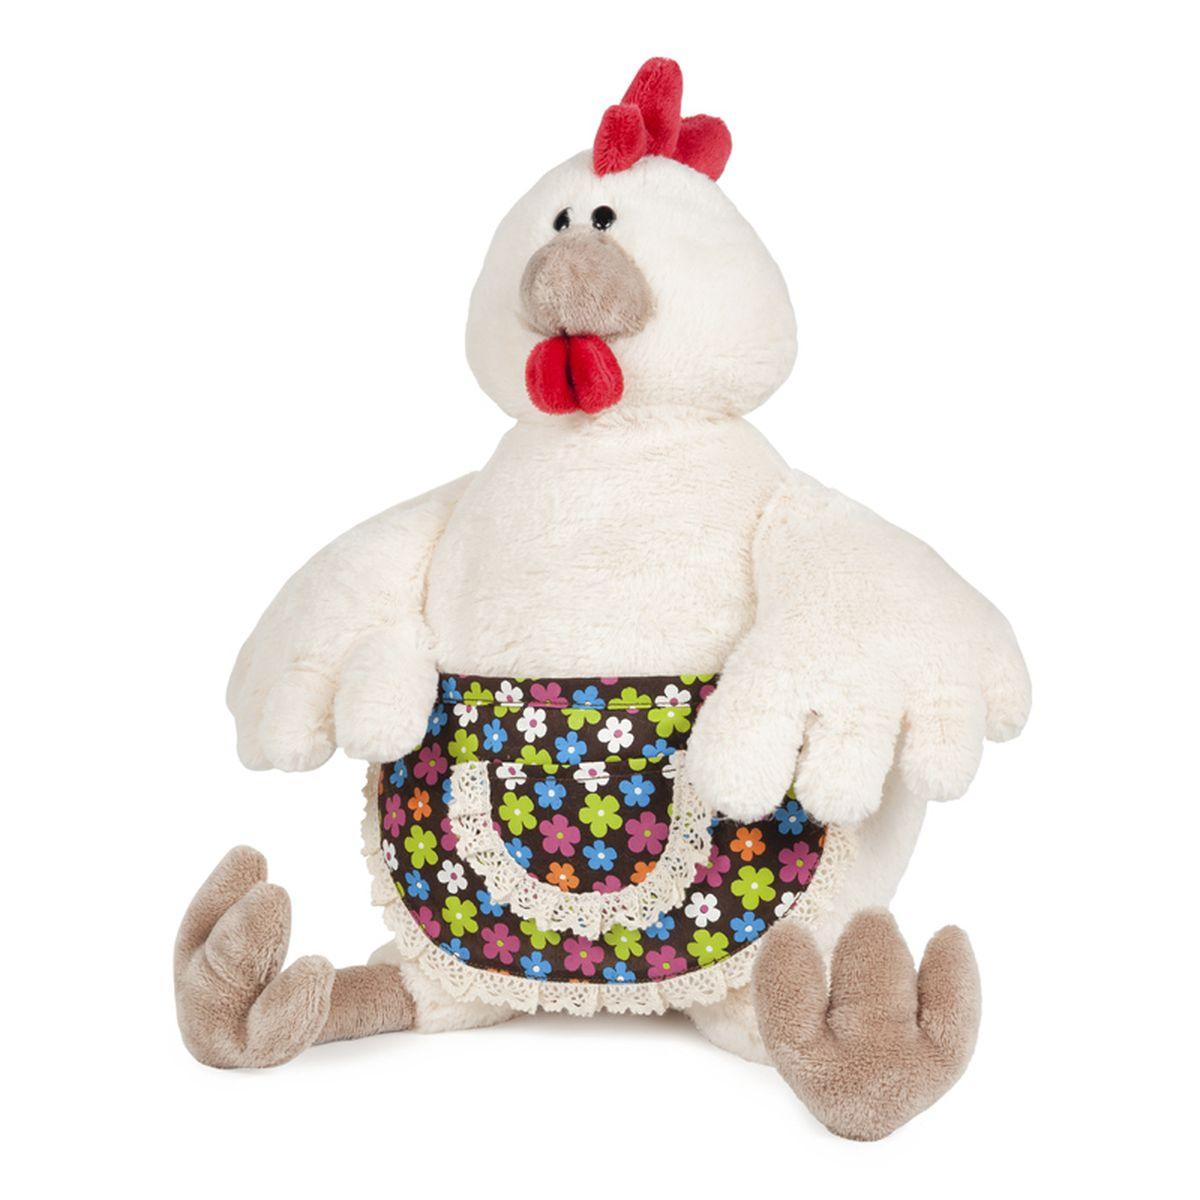 Maxi Toys Мягкая игрушка Курочка Ряба 38 смMT-TSA-8326-38S